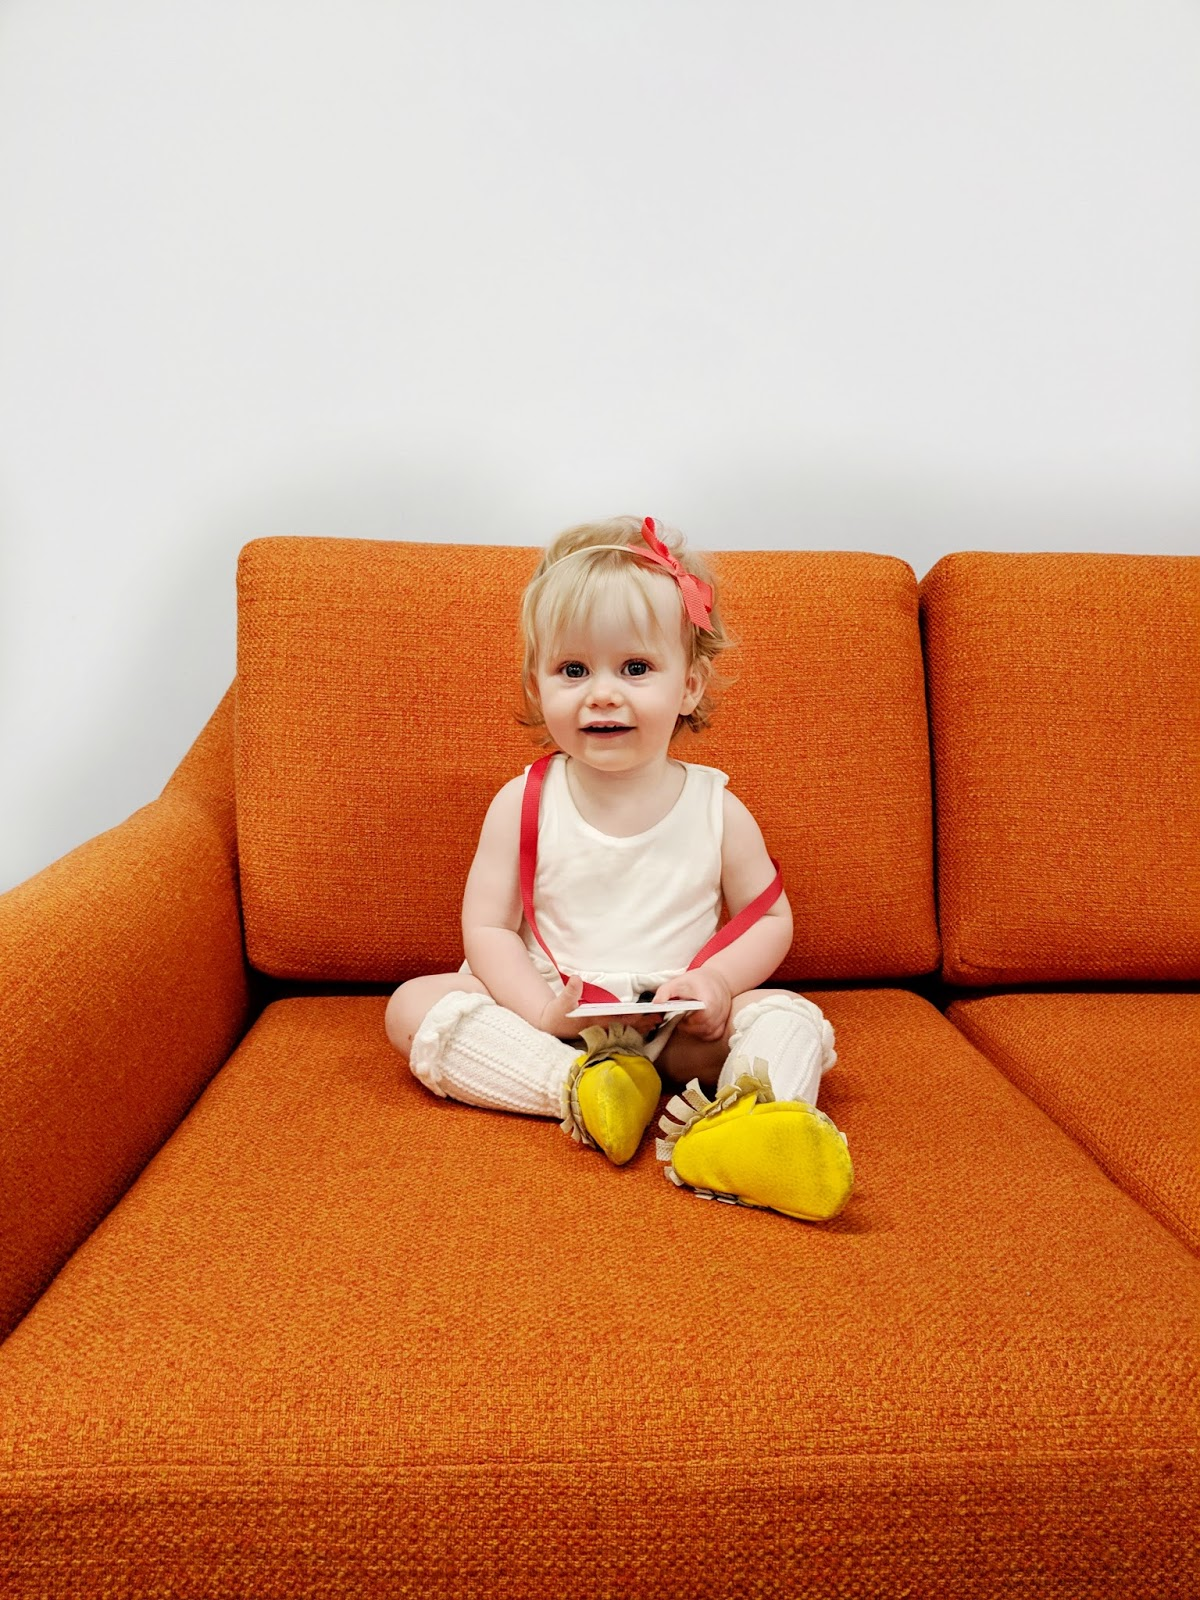 baby Googler take your child kid to work day work badge couch retro orange 1 year old tech baby genius